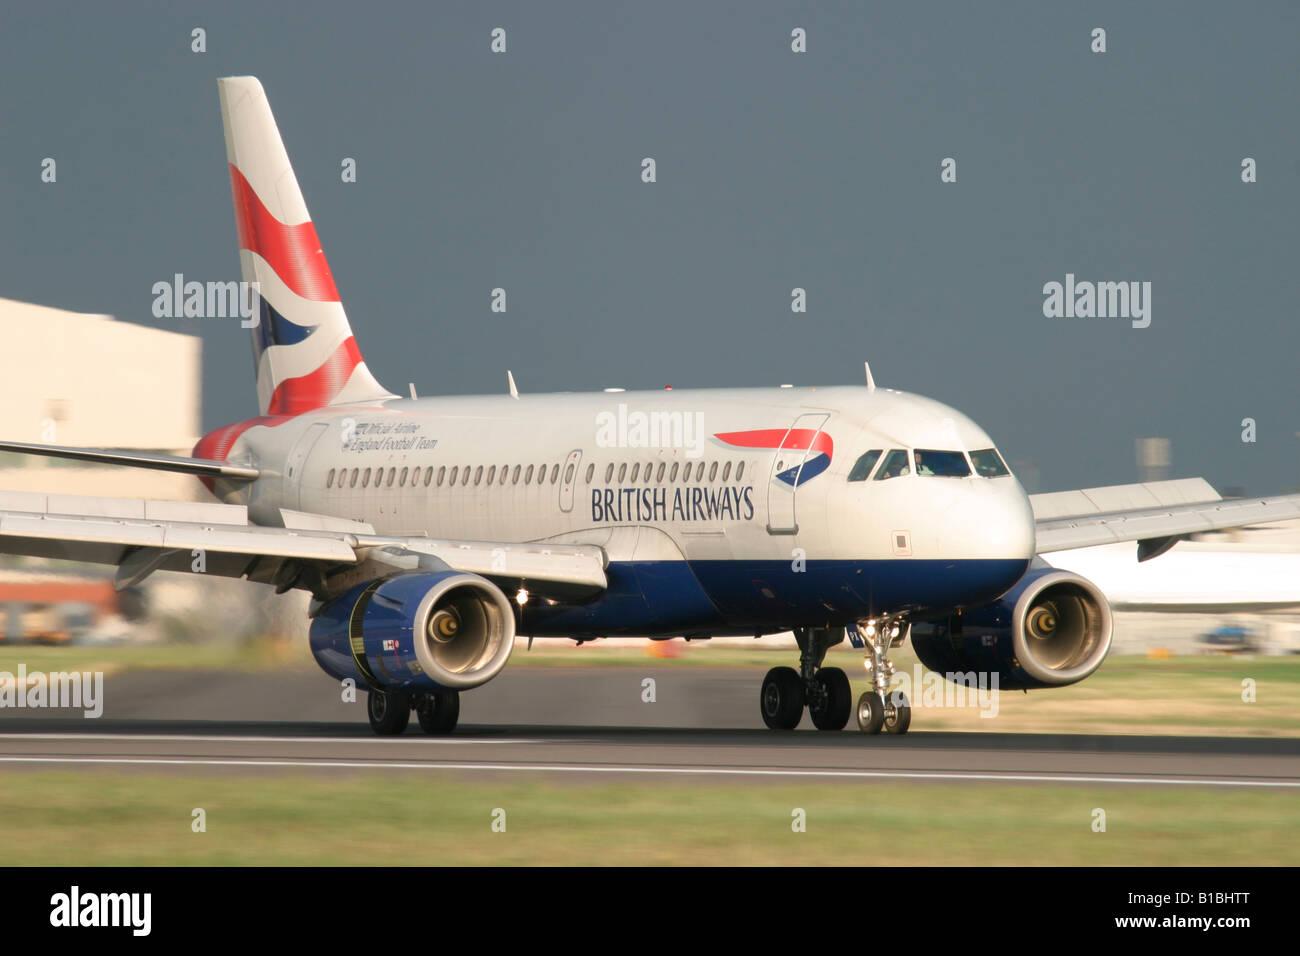 British Airways Airbus A319-131 landing at London Heathrow Airport, England, United Kingdom. - Stock Image